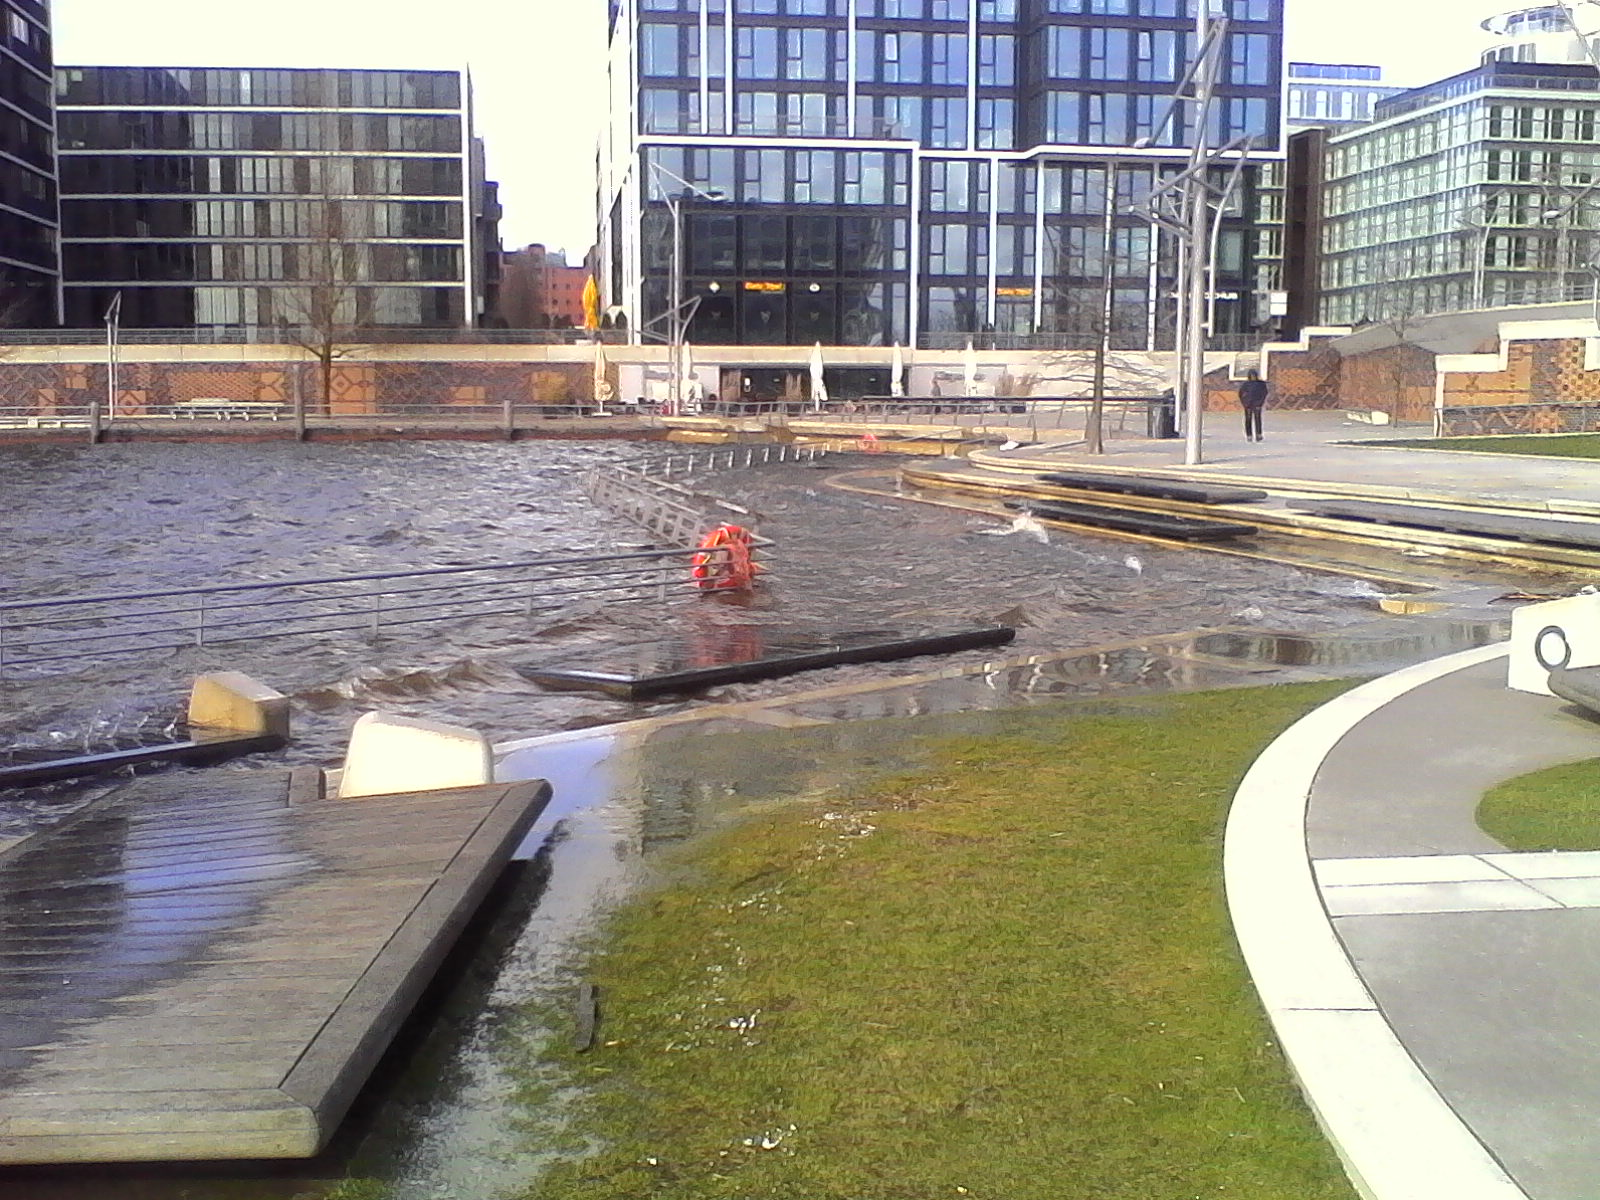 File:Hamburg Marco-Polo-Terrassen Hochwasser 2.jpg - Wikimedia Commons